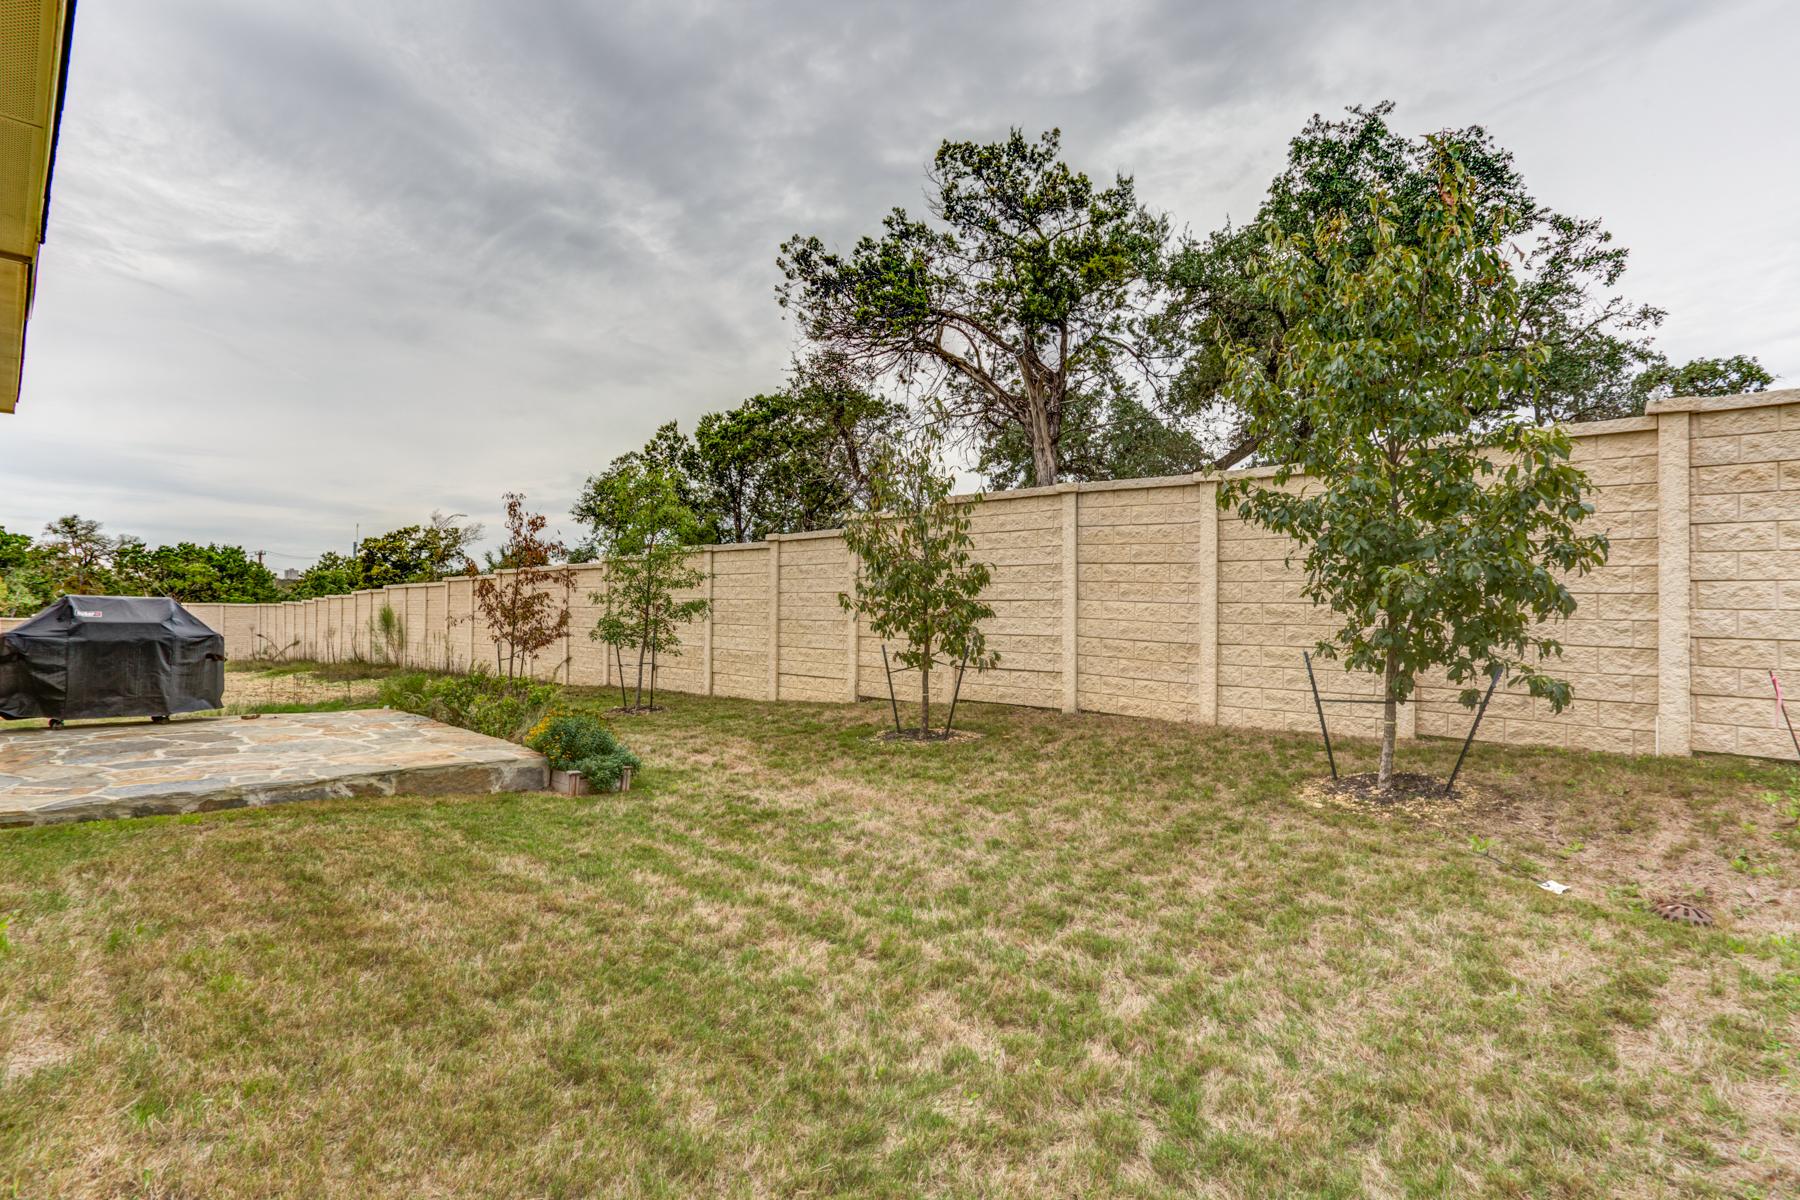 Additional photo for property listing at Wonderful Home in Estates of Alon 12110 Wildrose Hill San Antonio, Texas 78230 Estados Unidos